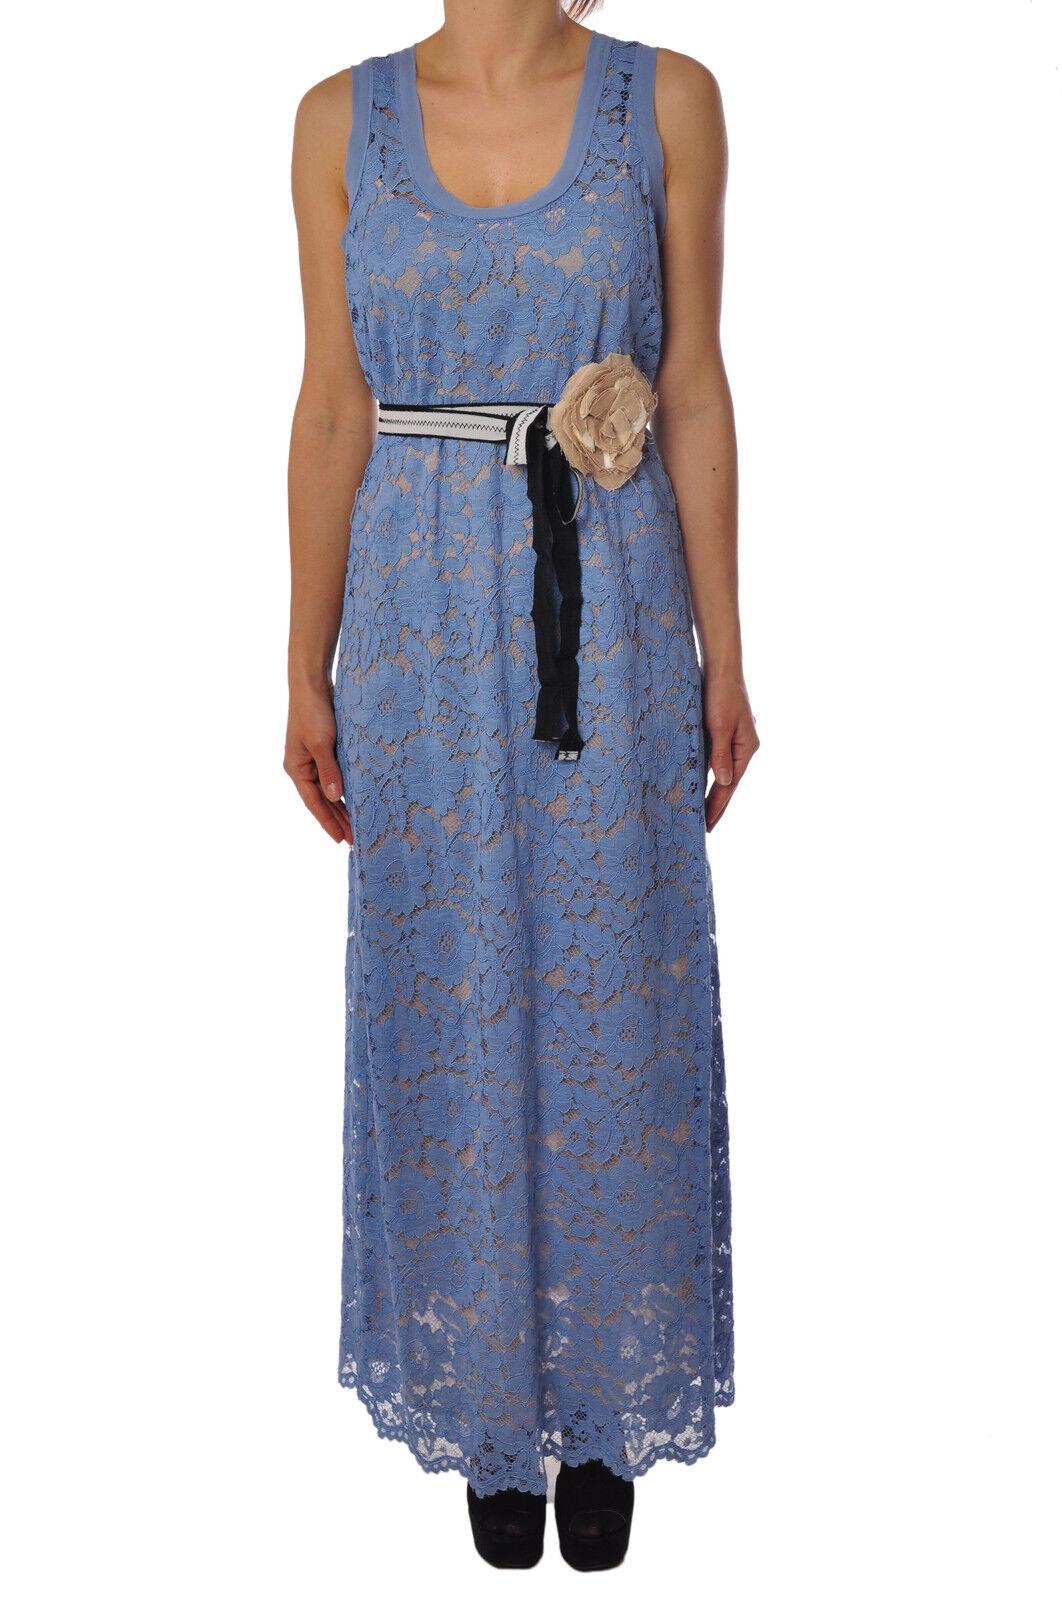 Twin Set  -  Länge  - Weiblich - azul - 2022627N174056  a precios asequibles